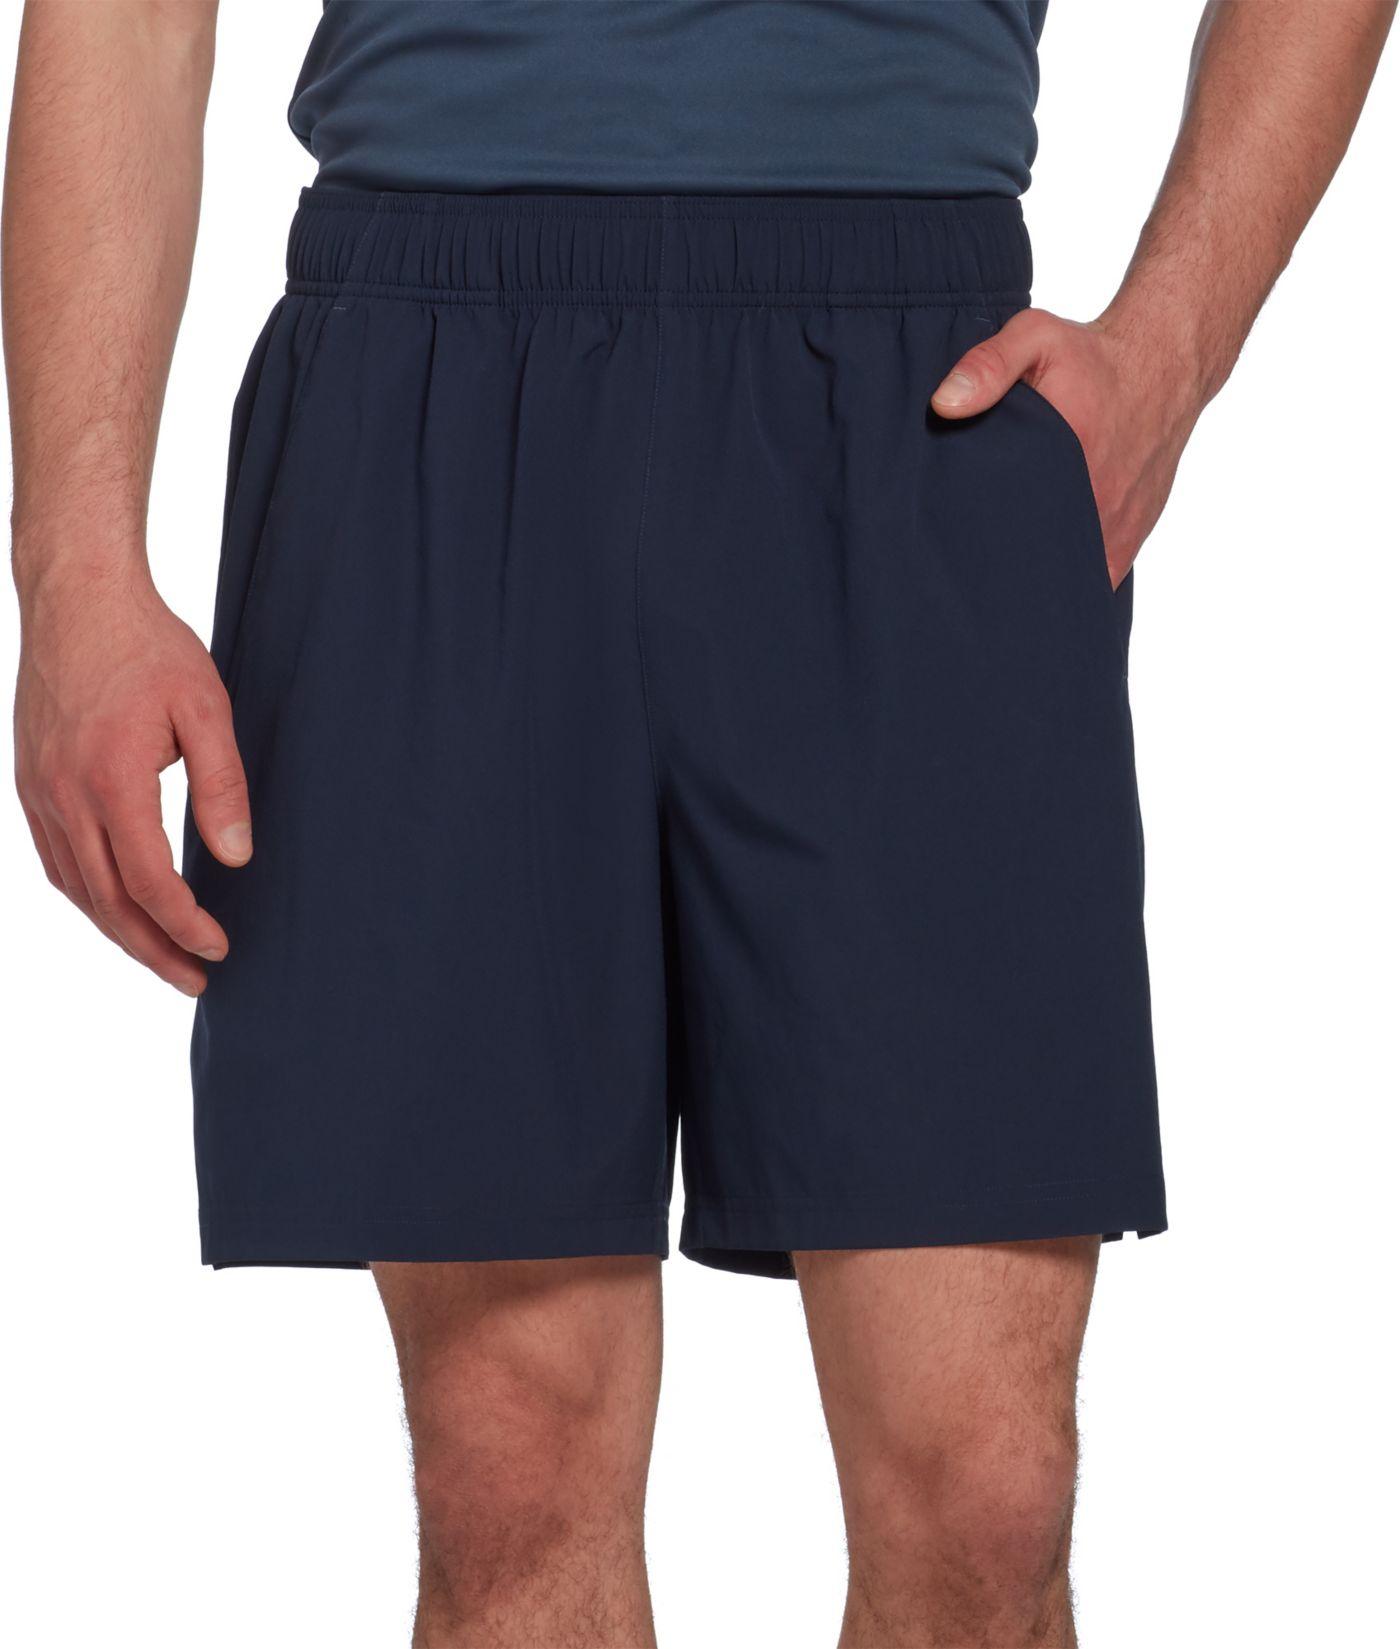 "Prince Men's Match 7"" Woven Tennis Shorts"